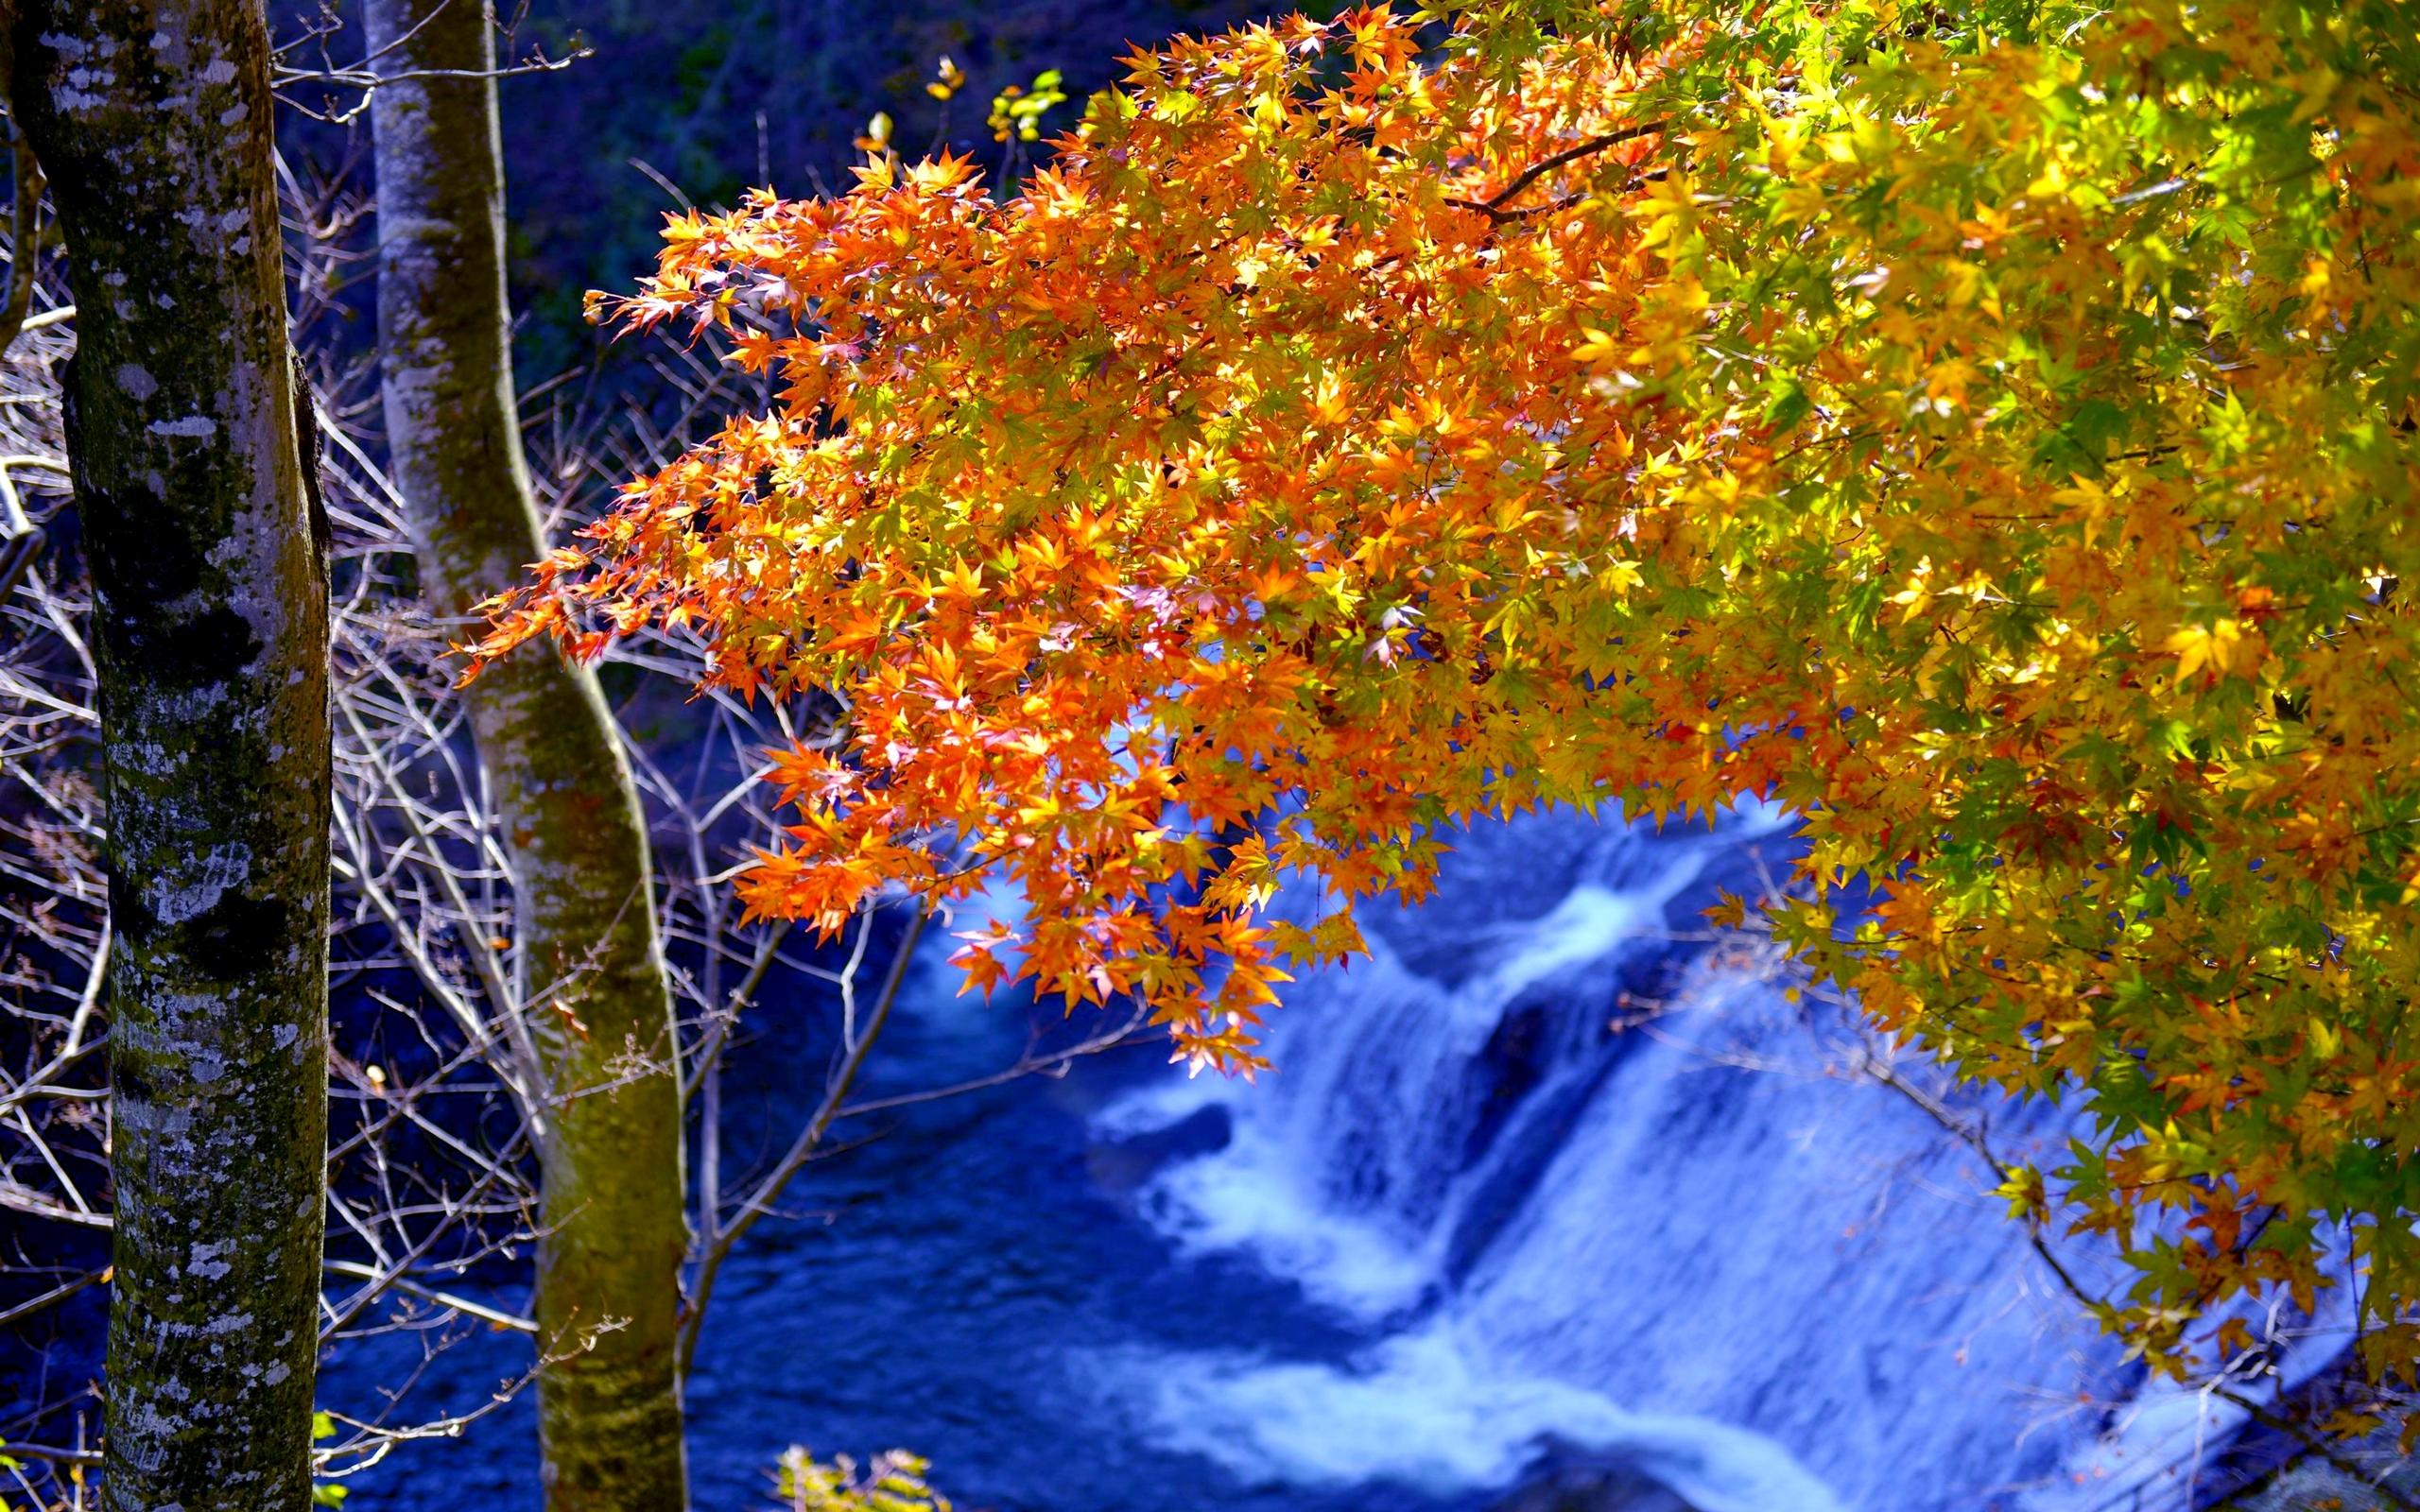 Niagara Falls Wallpaper 1920x1080 Natural Forest Waterfall Falls In Autumn Hd Quality